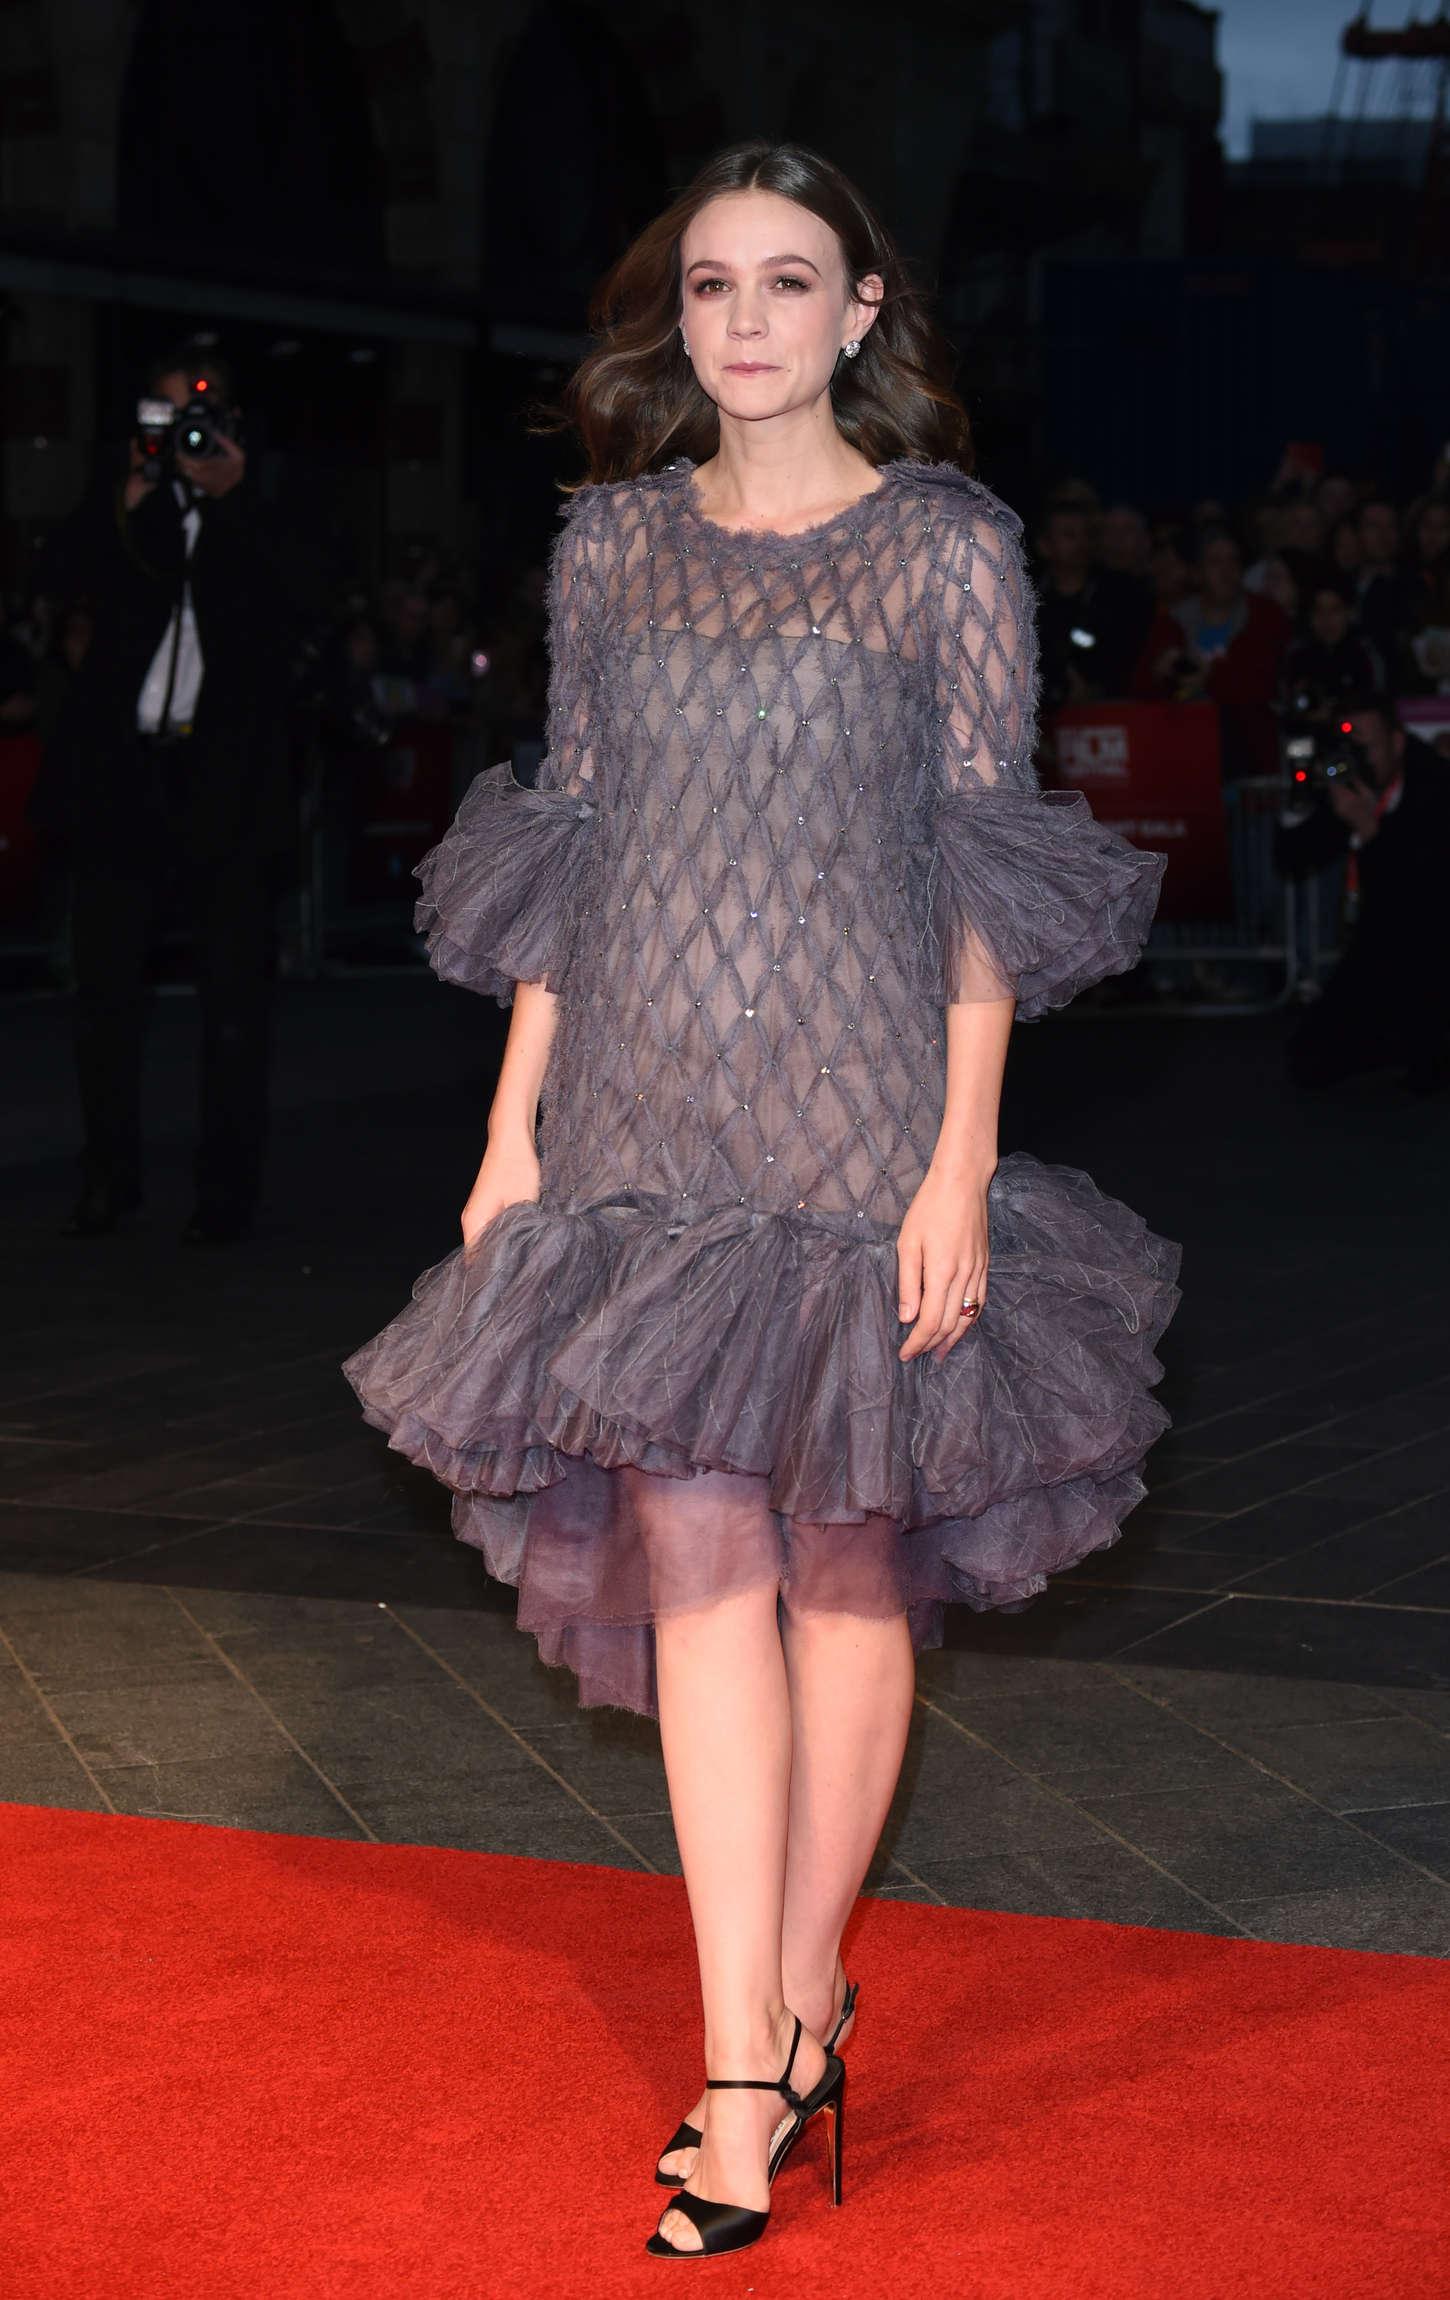 Carey Mulligan 2015 : Carey Mulligan: Suffragette Premiere -05